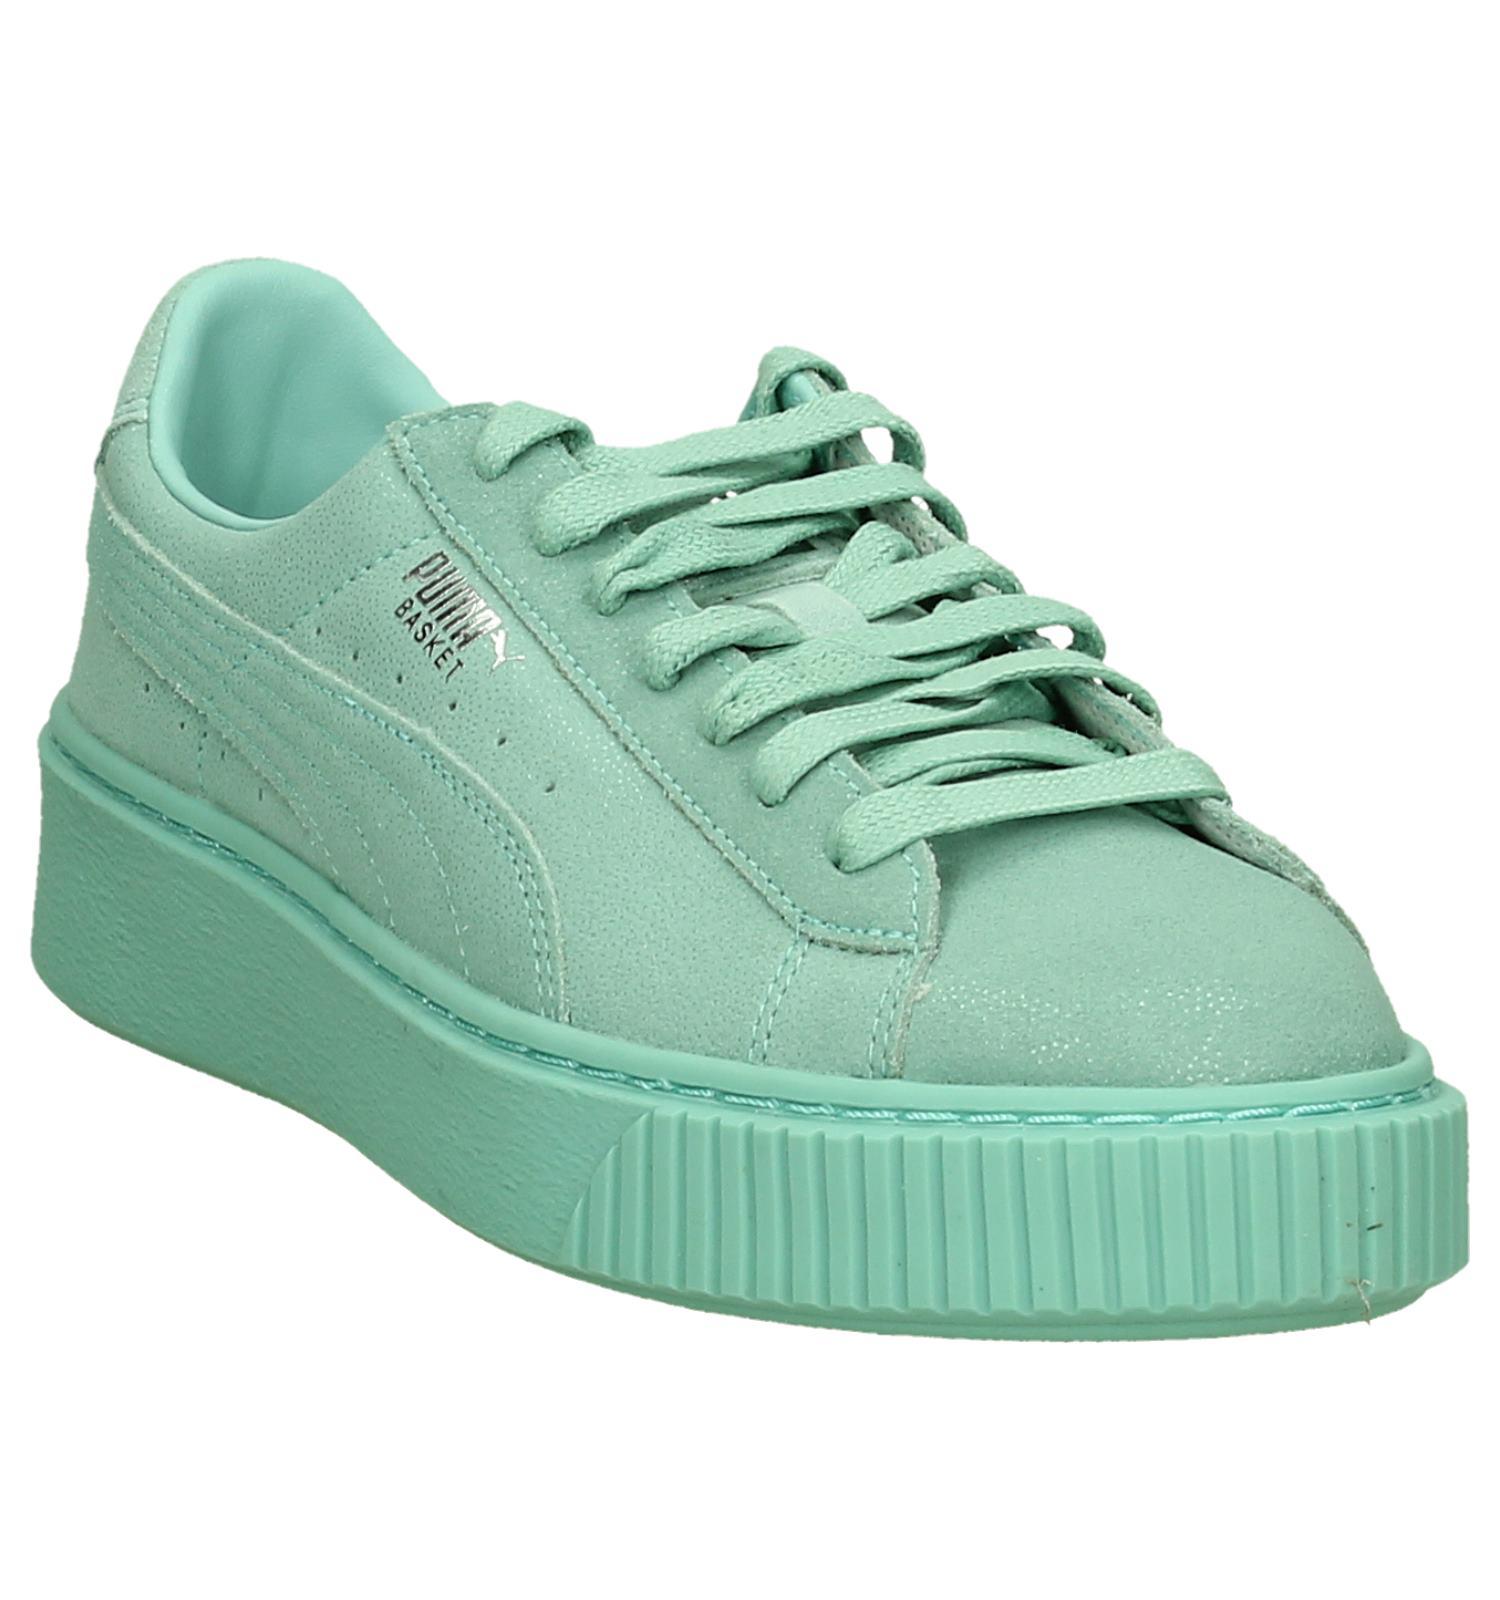 6b57045868c5 Puma Platform Reset Turquoise Sneakers